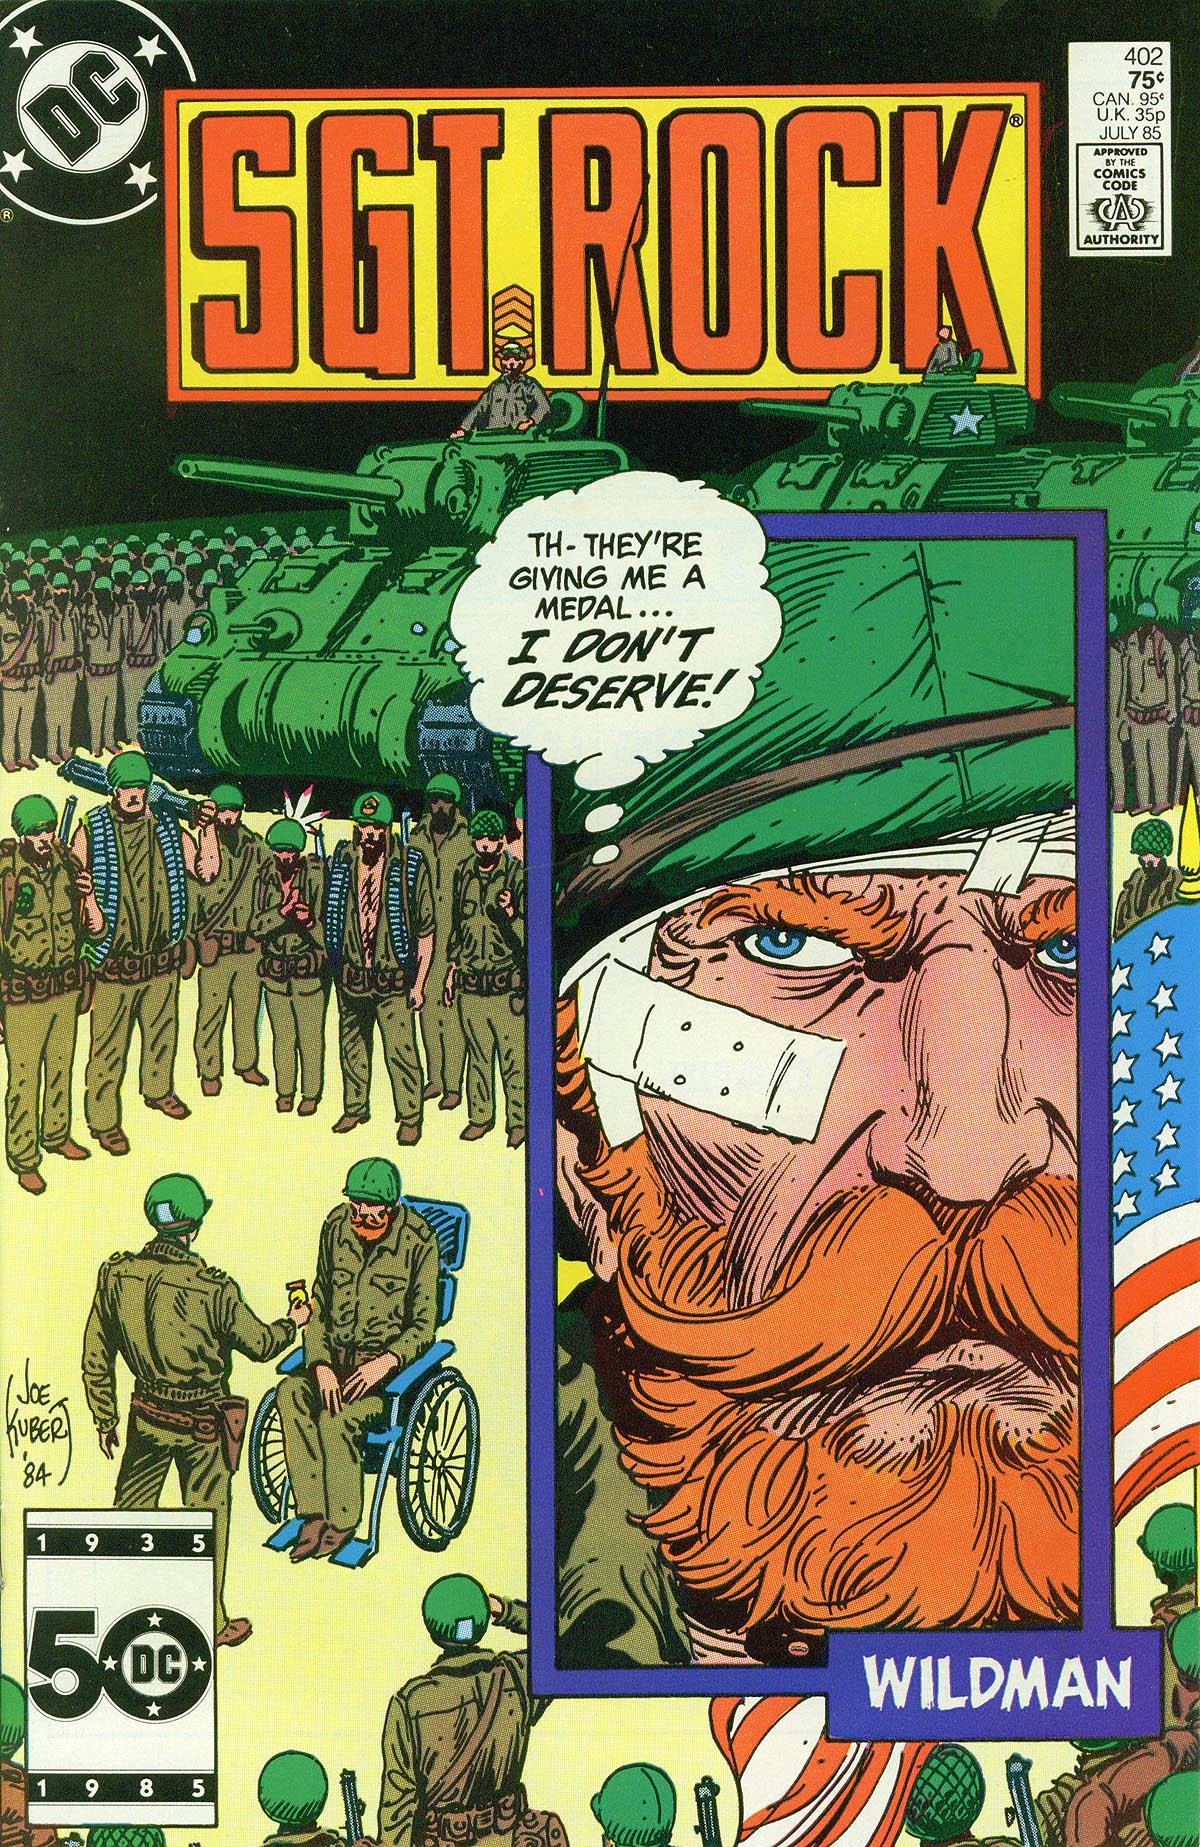 Read online Sgt. Rock comic -  Issue #402 - 1